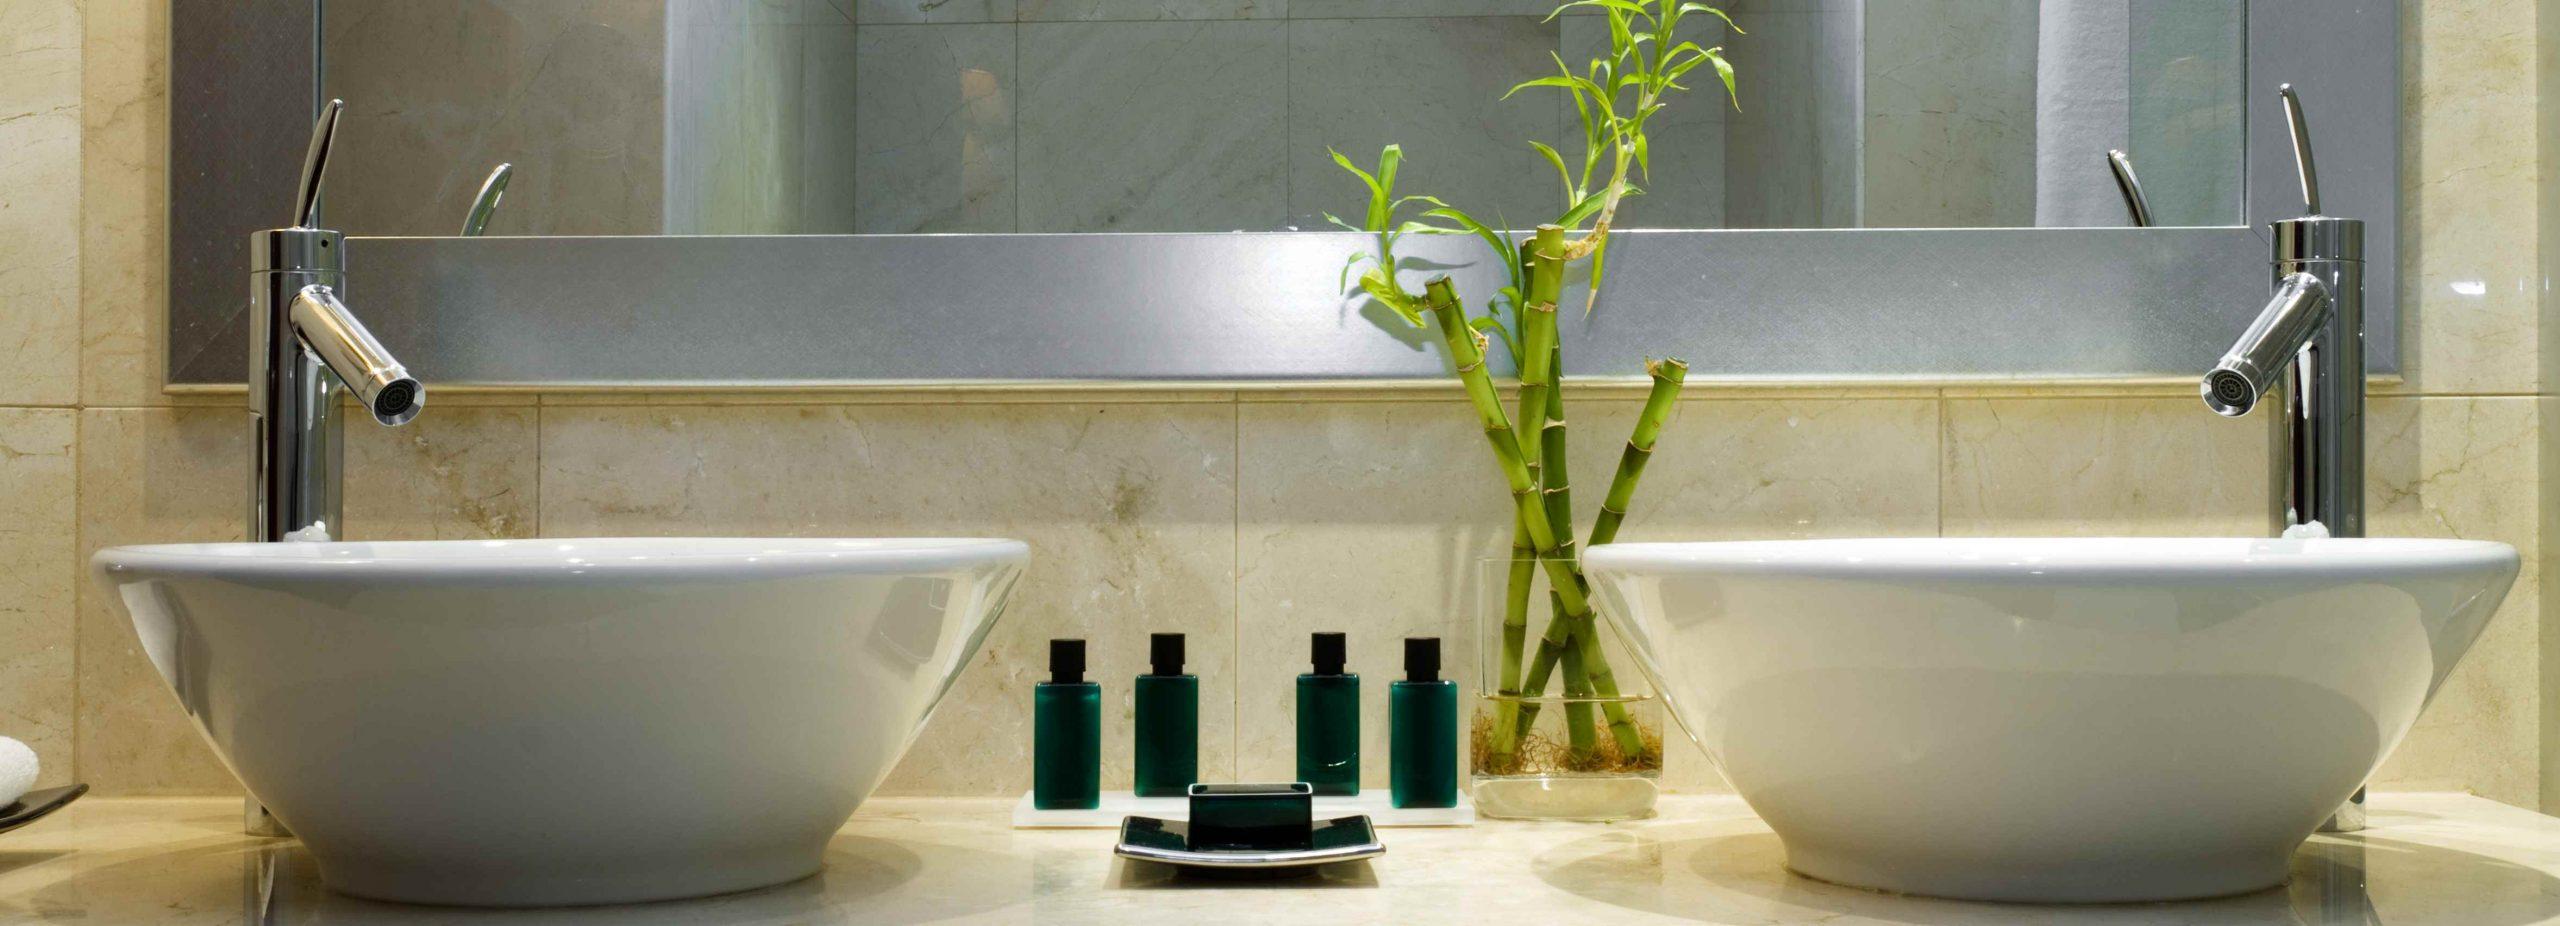 Bathroom Renovations Bankstown